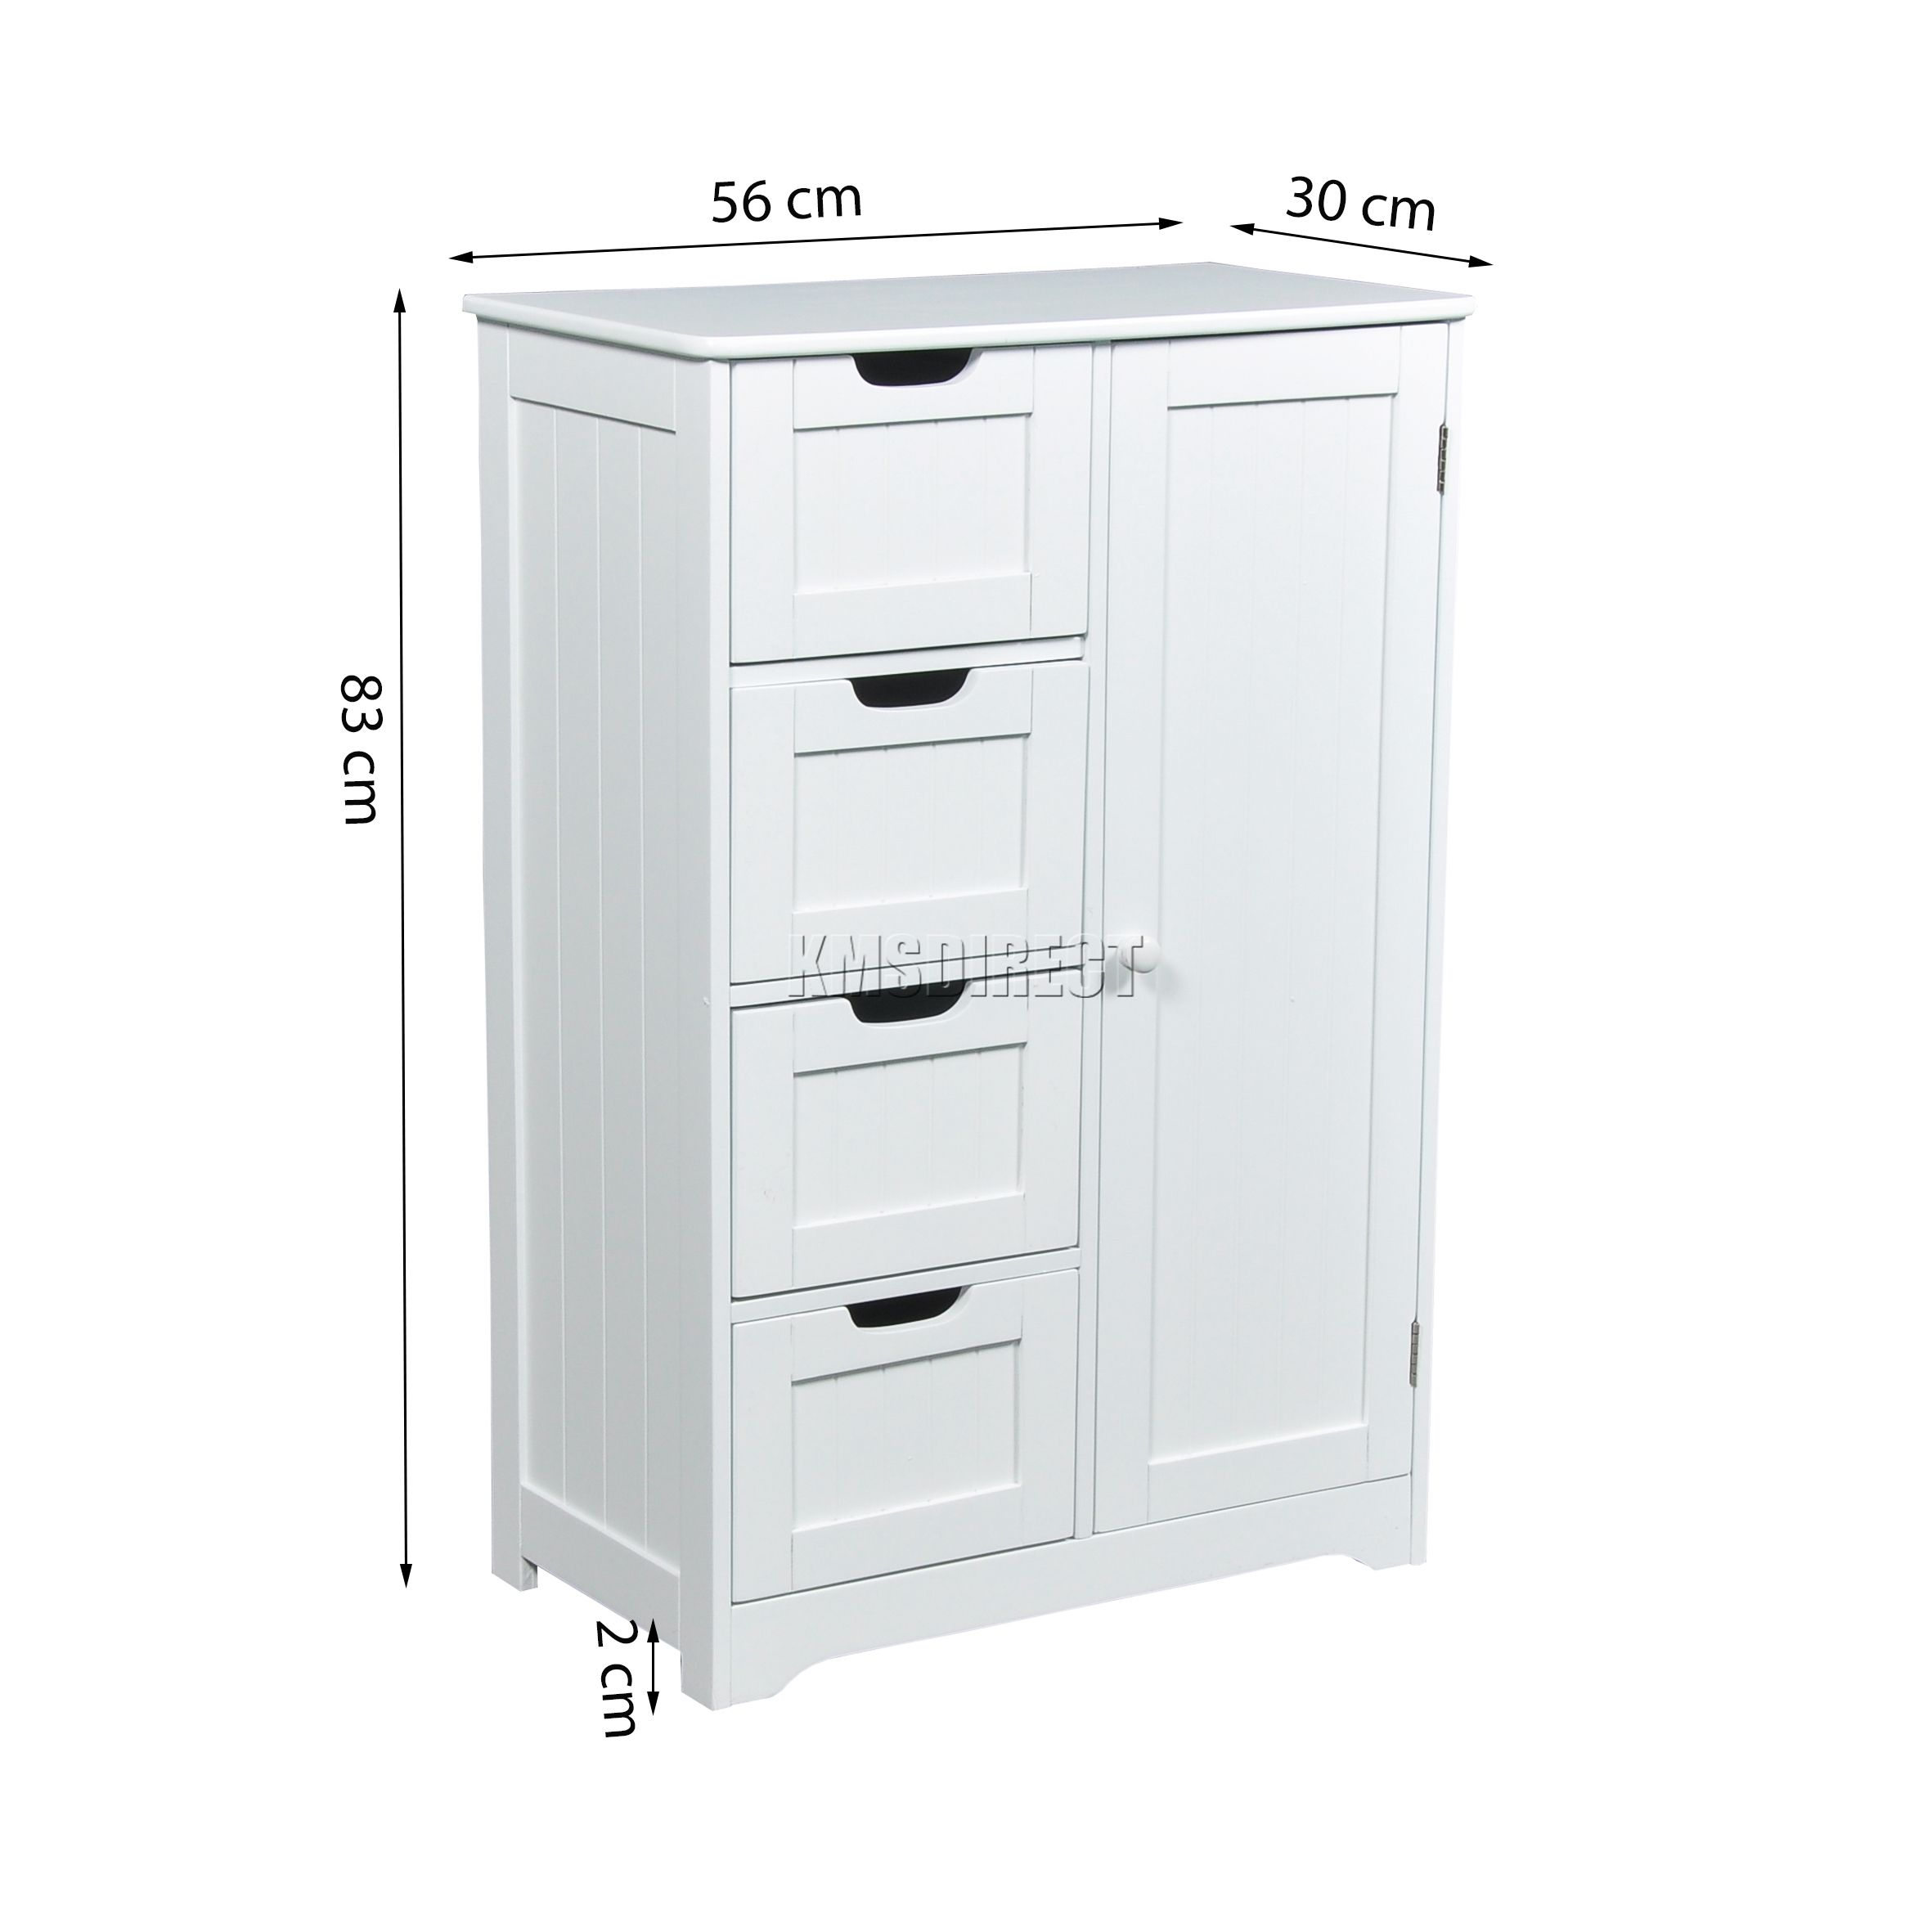 Details About Westwood Bathroom Storage Cabinet Wooden 4 for measurements 2362 X 2362